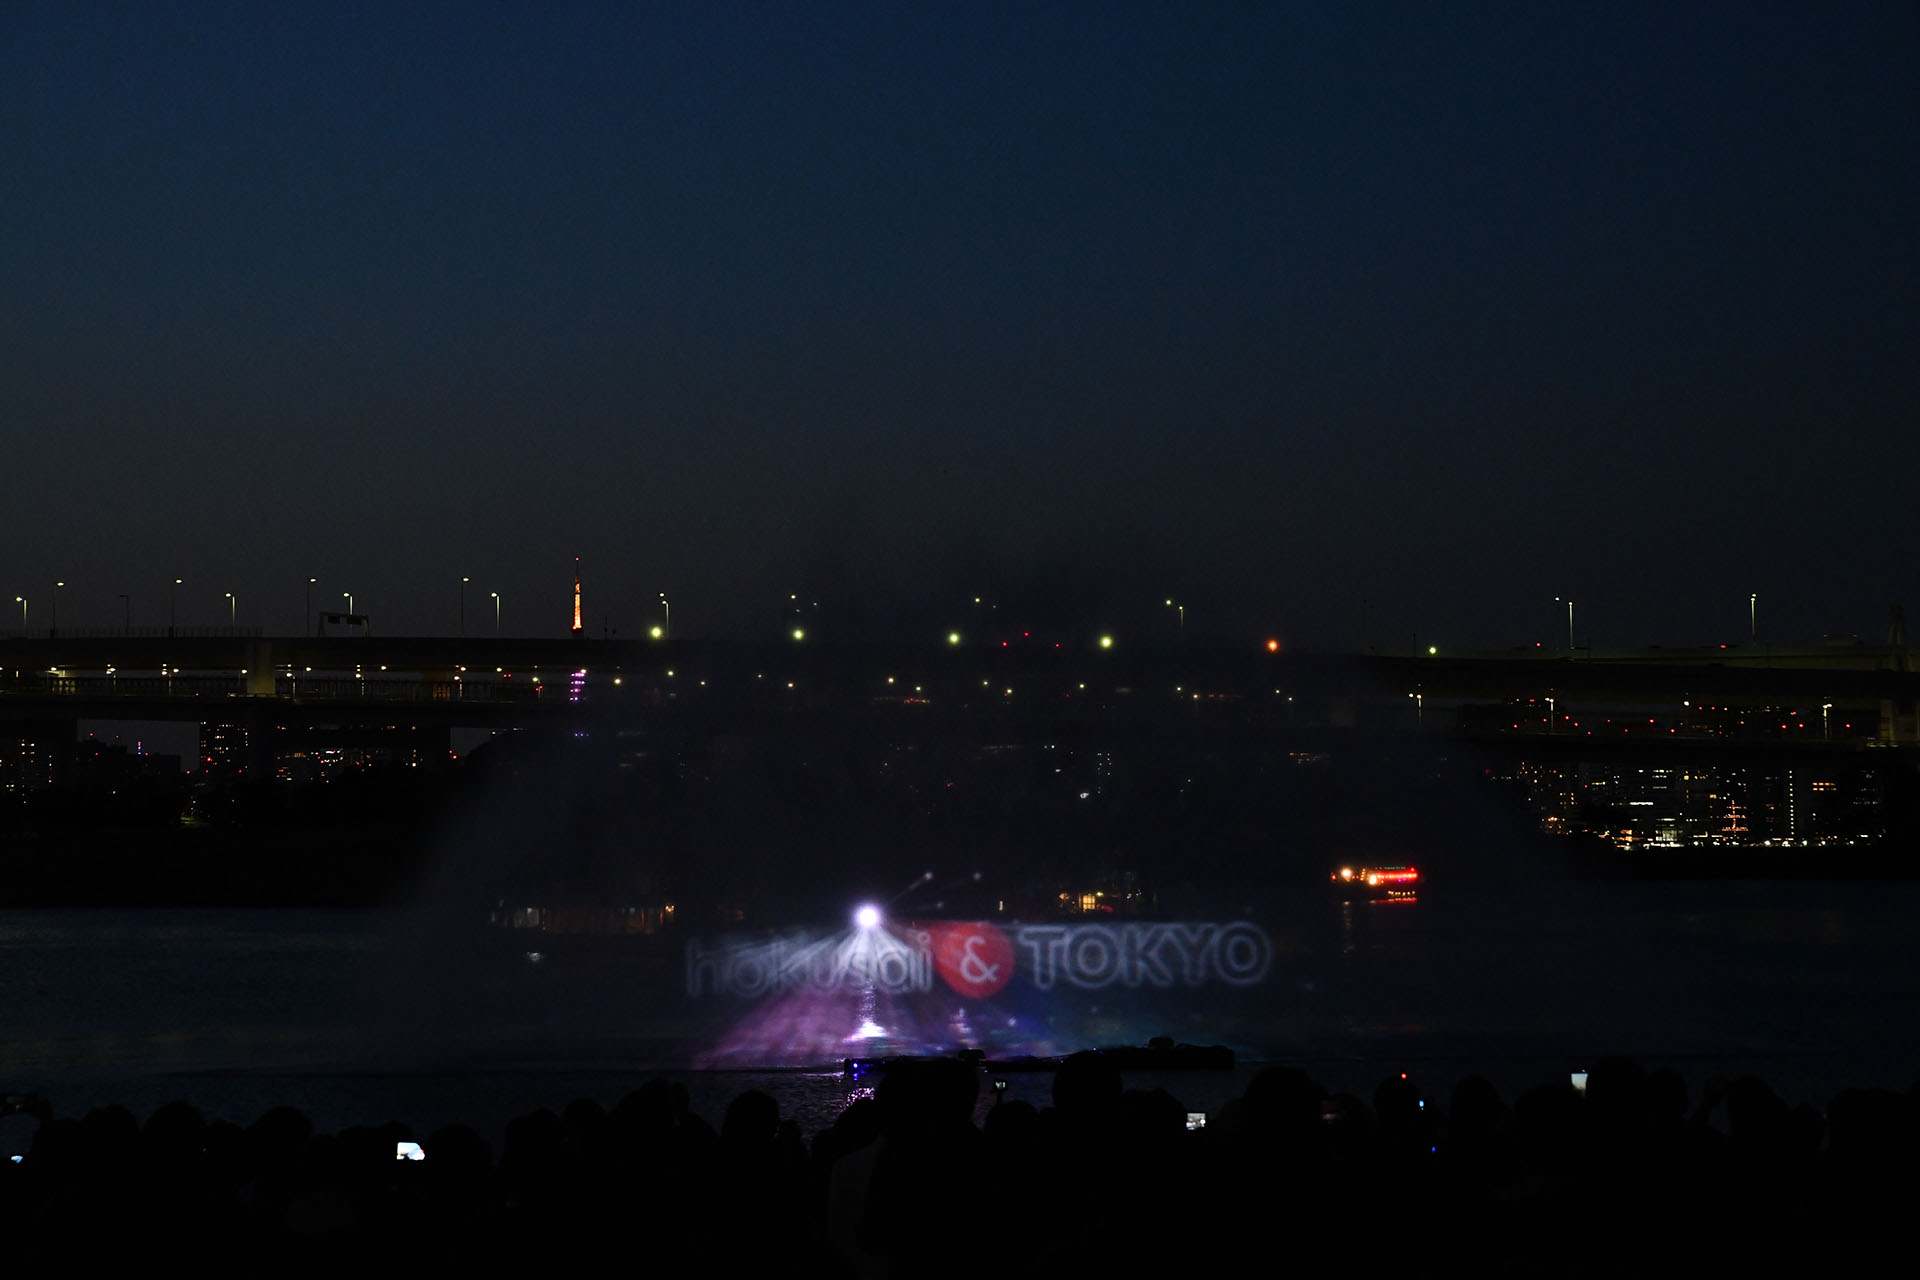 hokusai&TOKYO 水辺を彩る江戸祭 Nikon D850 タムロン 水幕電子描画 ウォータープロジェクションマッピング